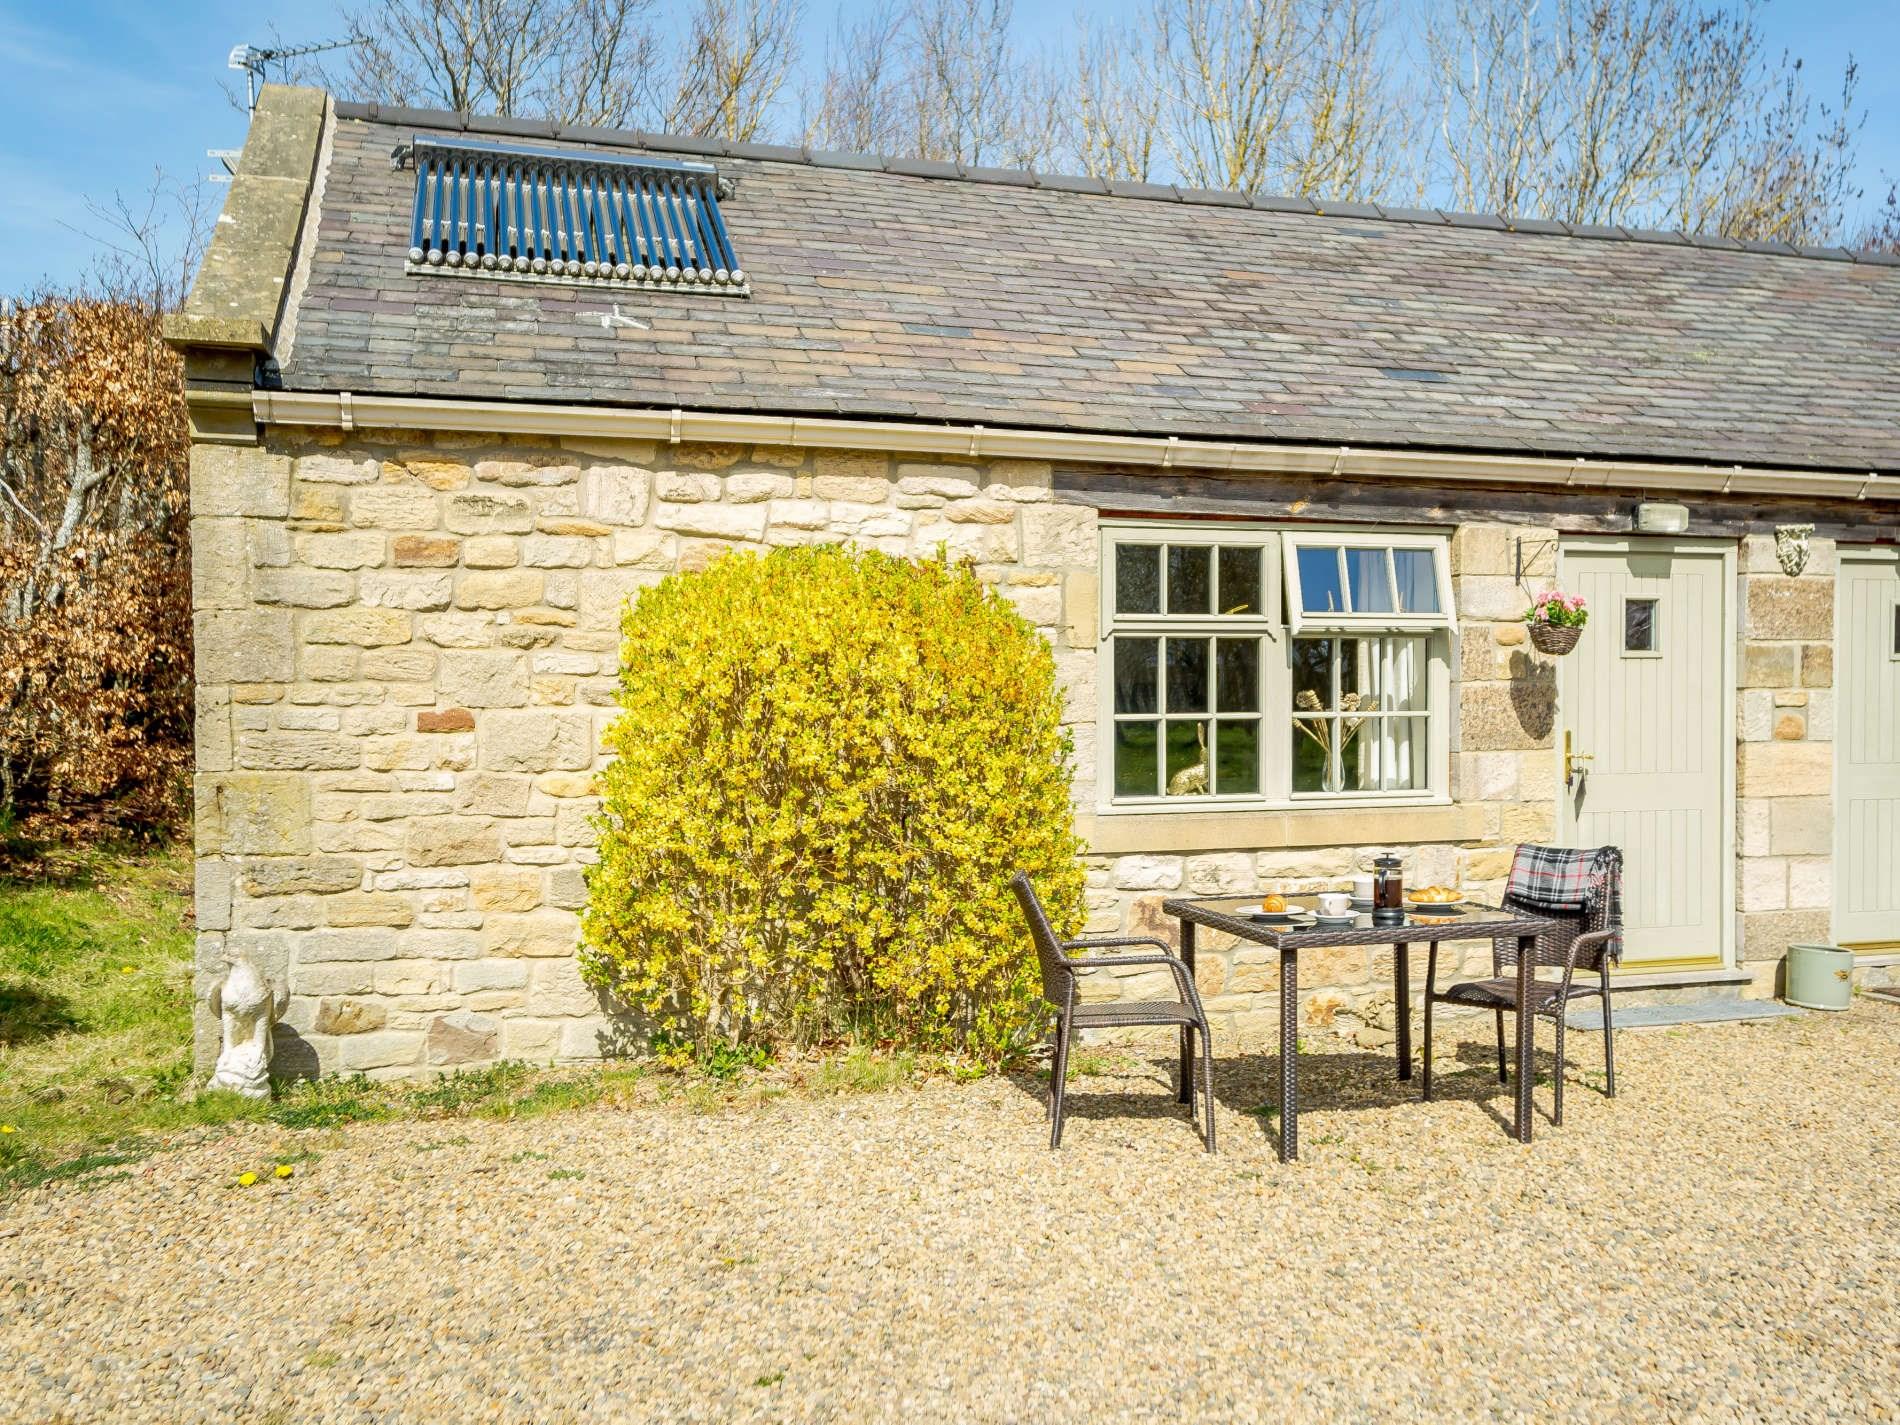 1 Bedroom Cottage in Hexham, Northumbria